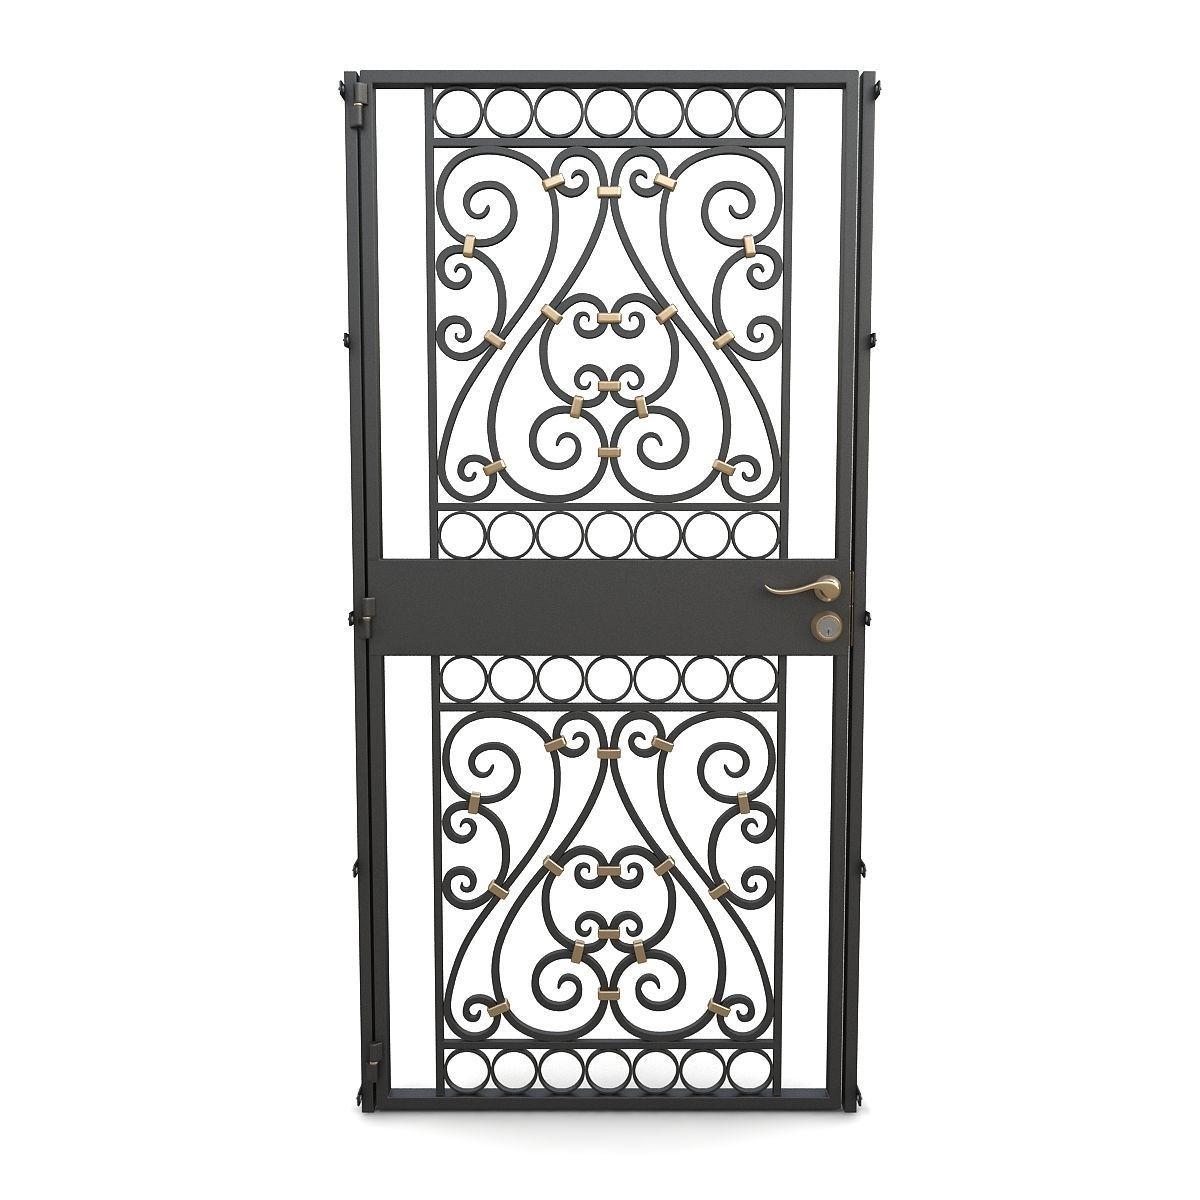 Wrought iron gate 02